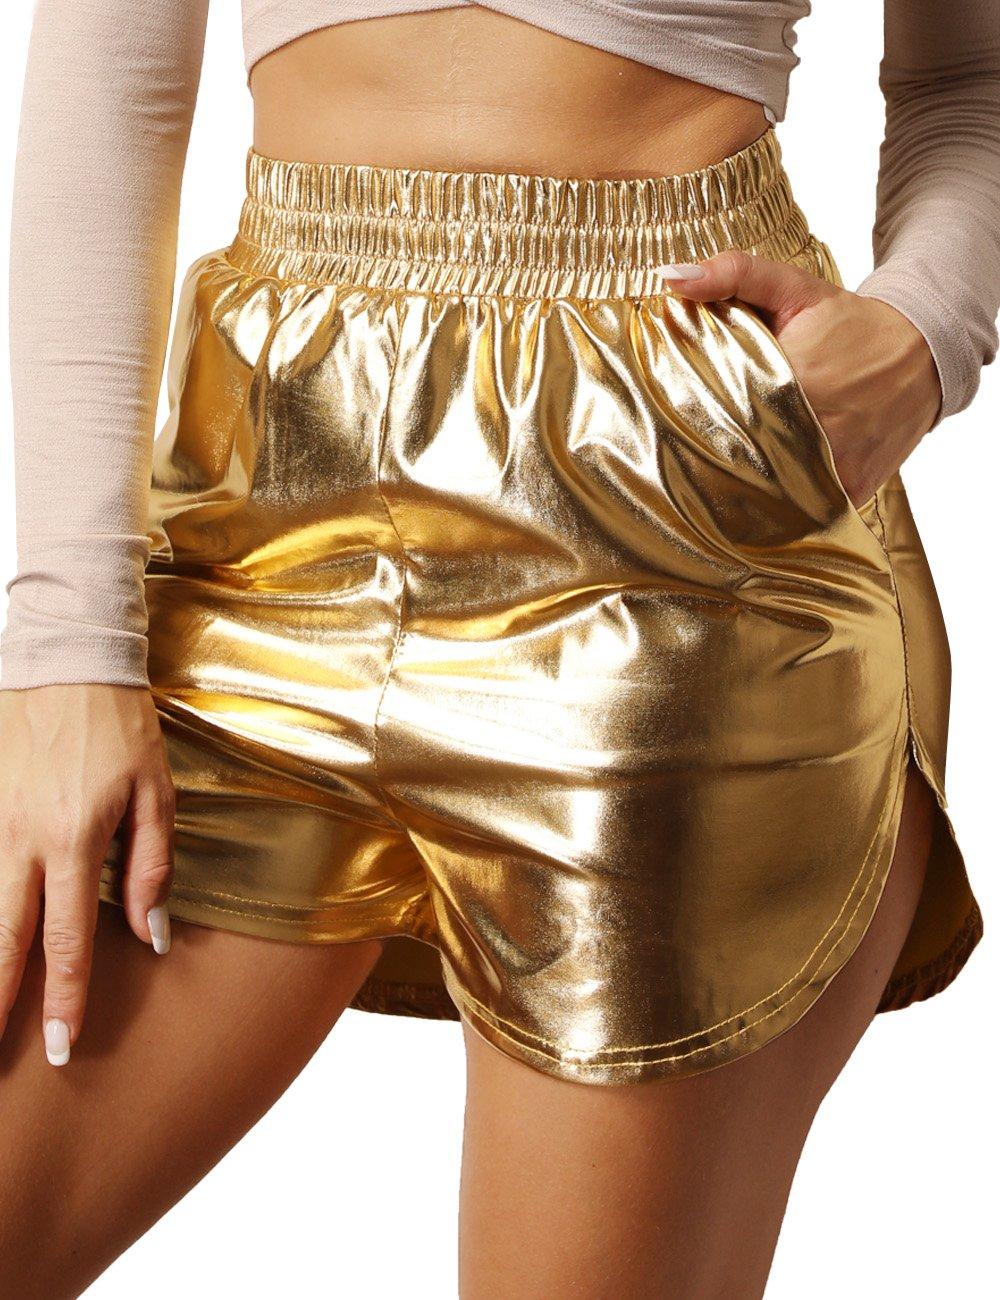 Women's Shiny Metallic Shorts Summer Yoga High Waist Hot Shorts Gold M